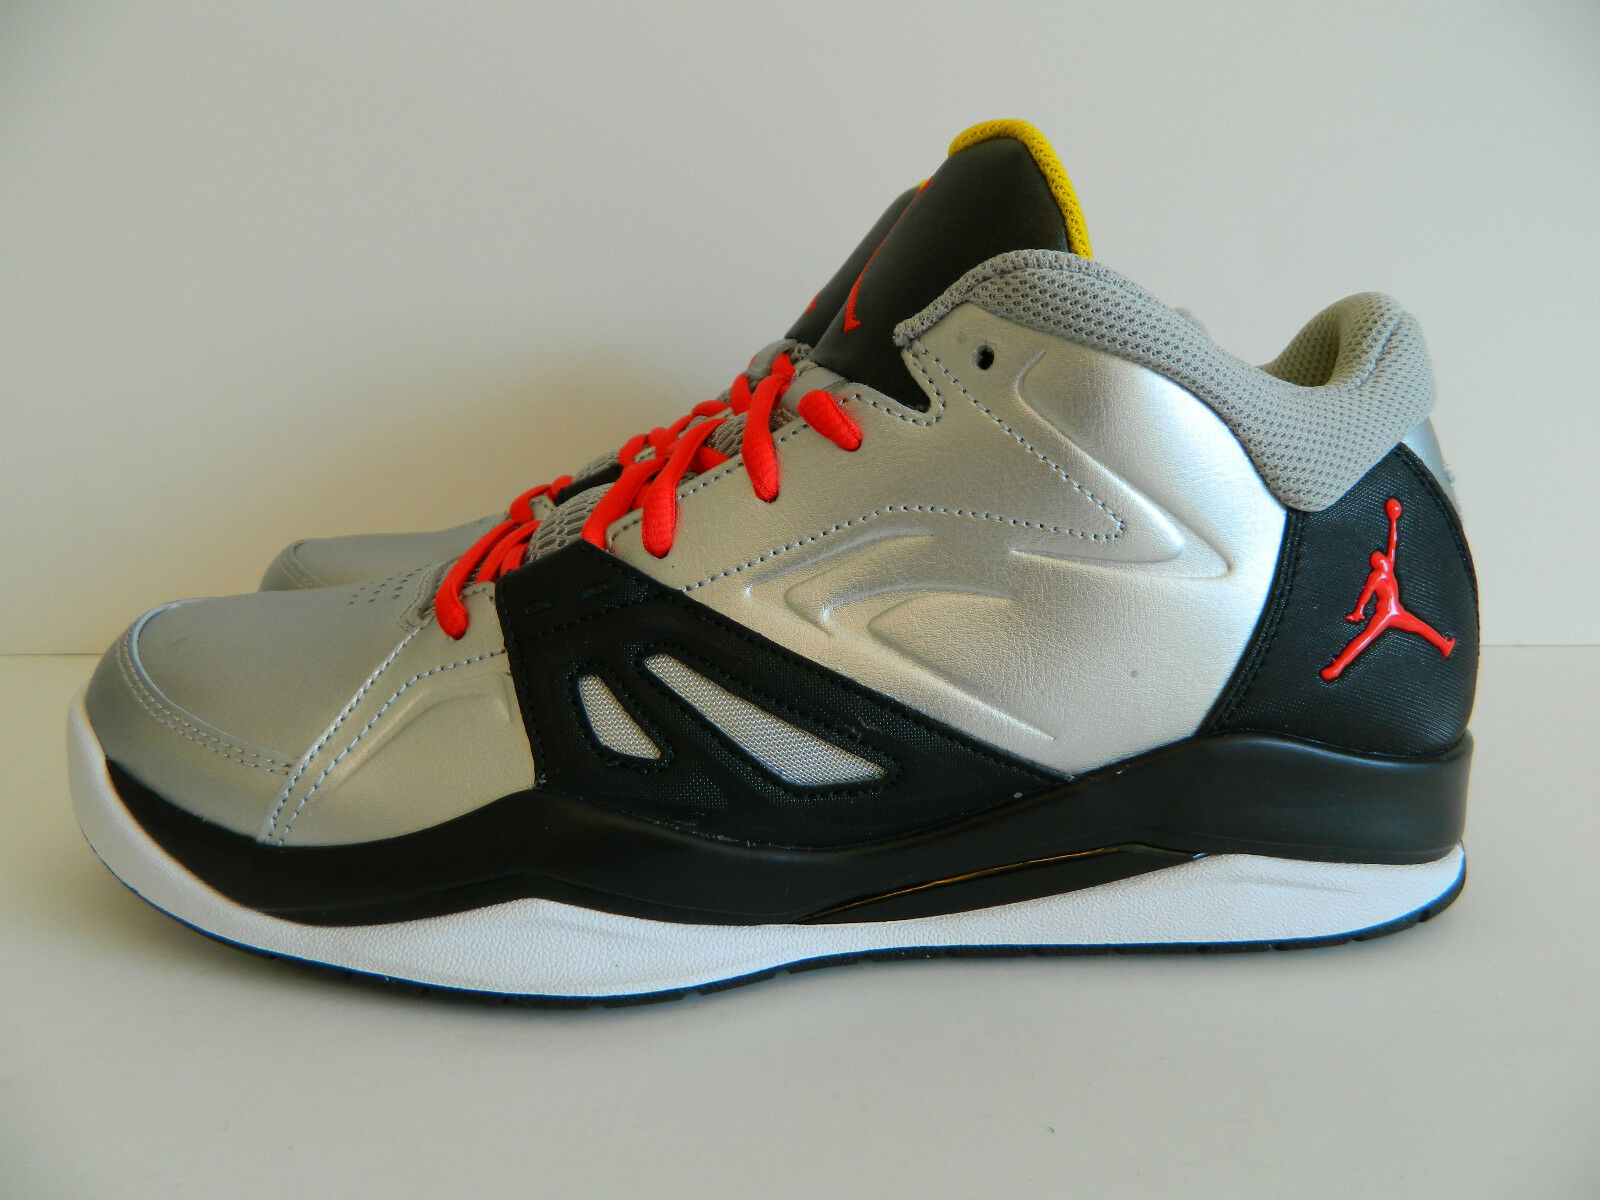 Nike Jordan Ace 23 ( Mtllc Silver / Chllng Red-Black-White ) ( 551765 003 )